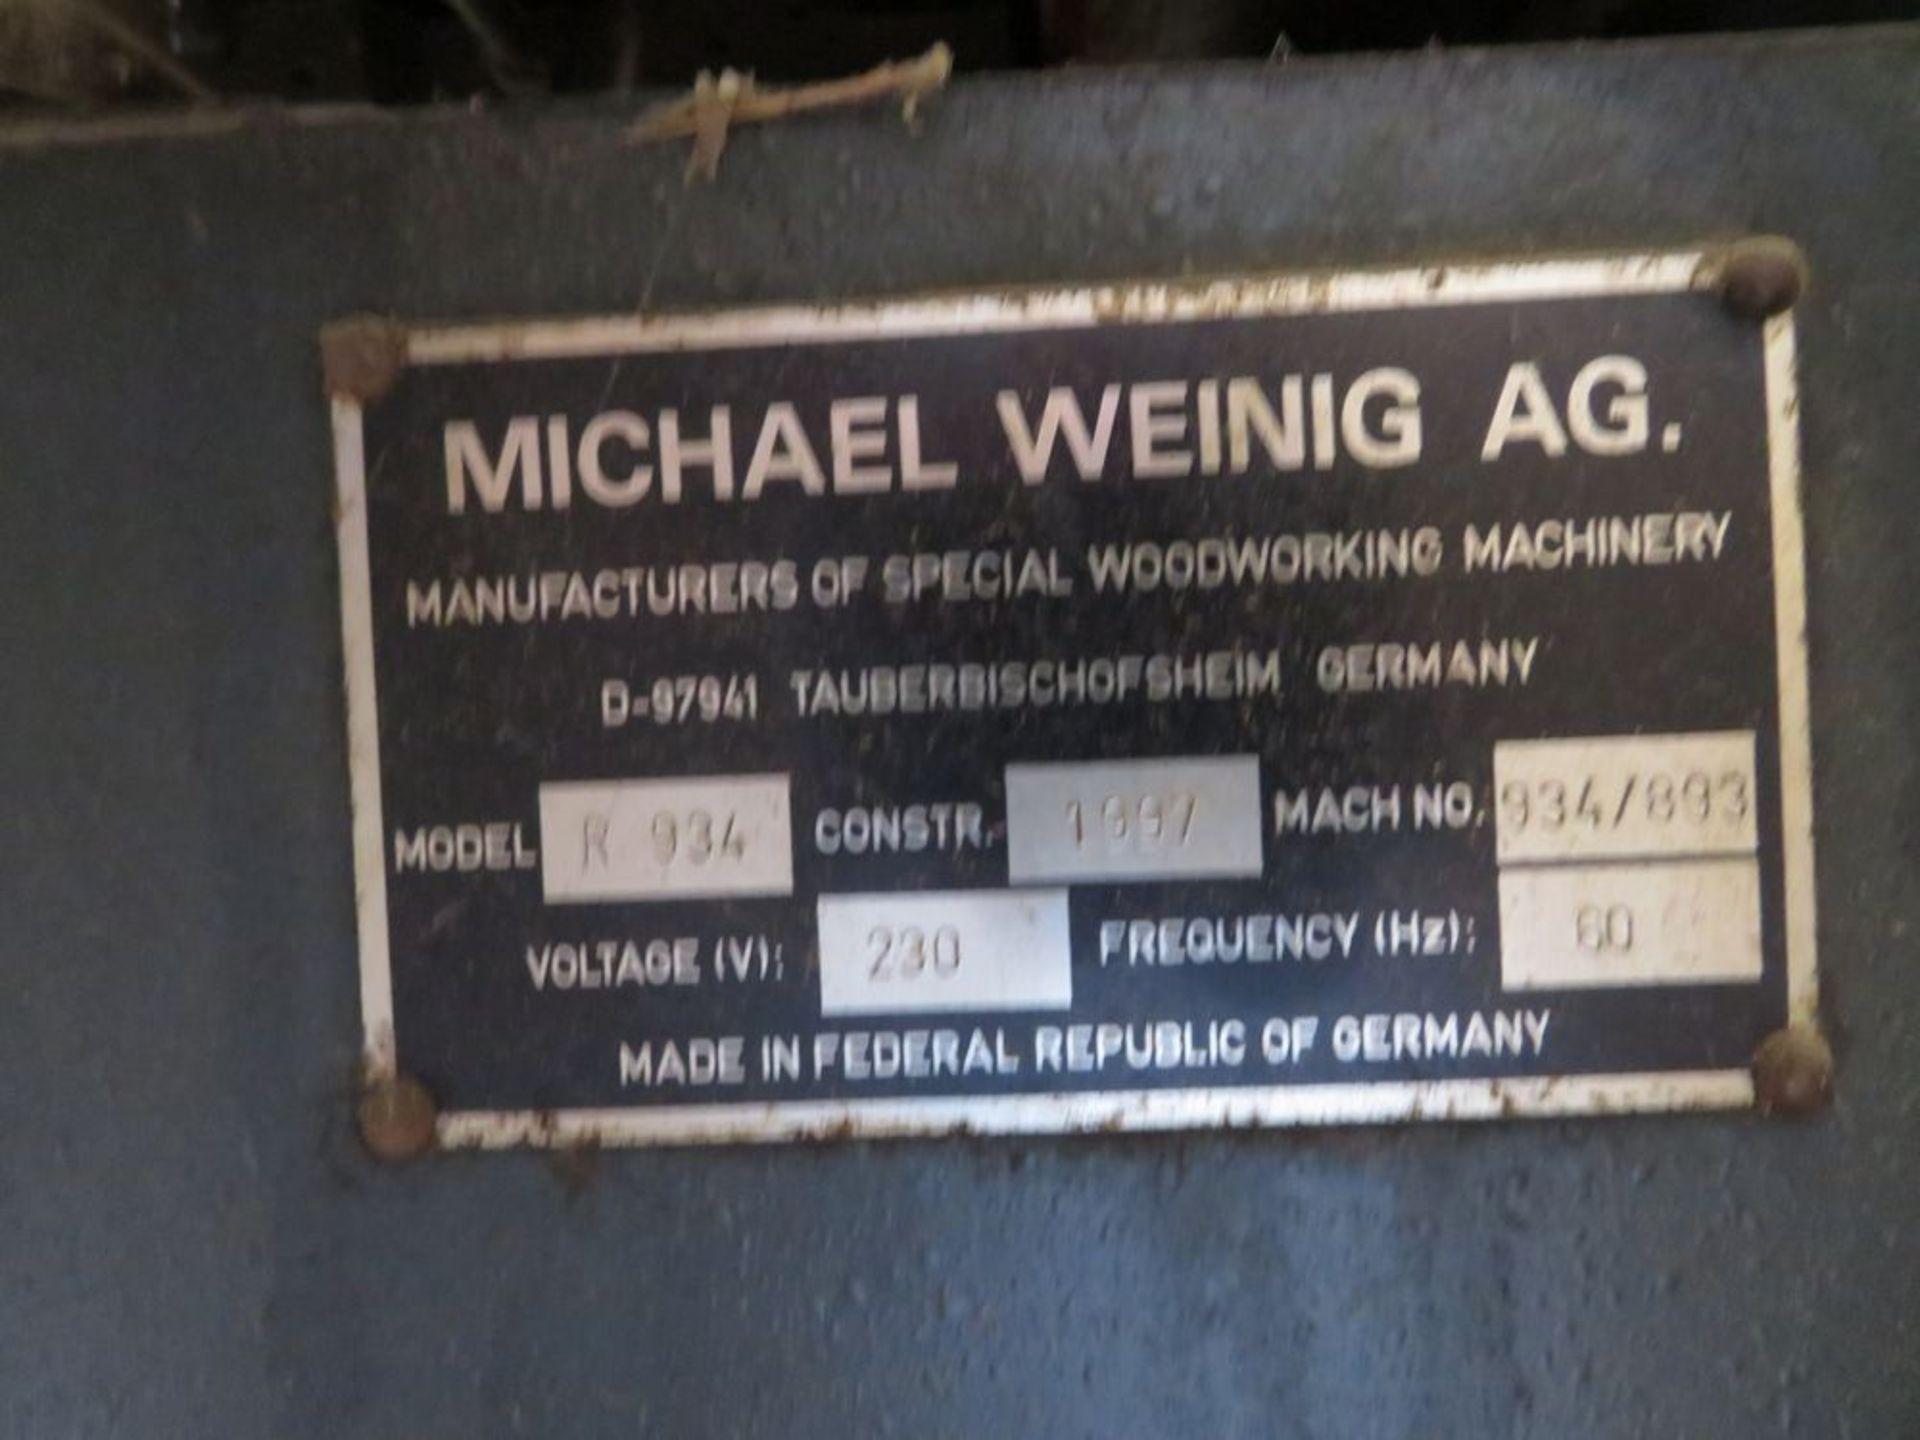 Lot 16 - Weinig Rondamat 934 Knife Grinder, 260V, 3PH